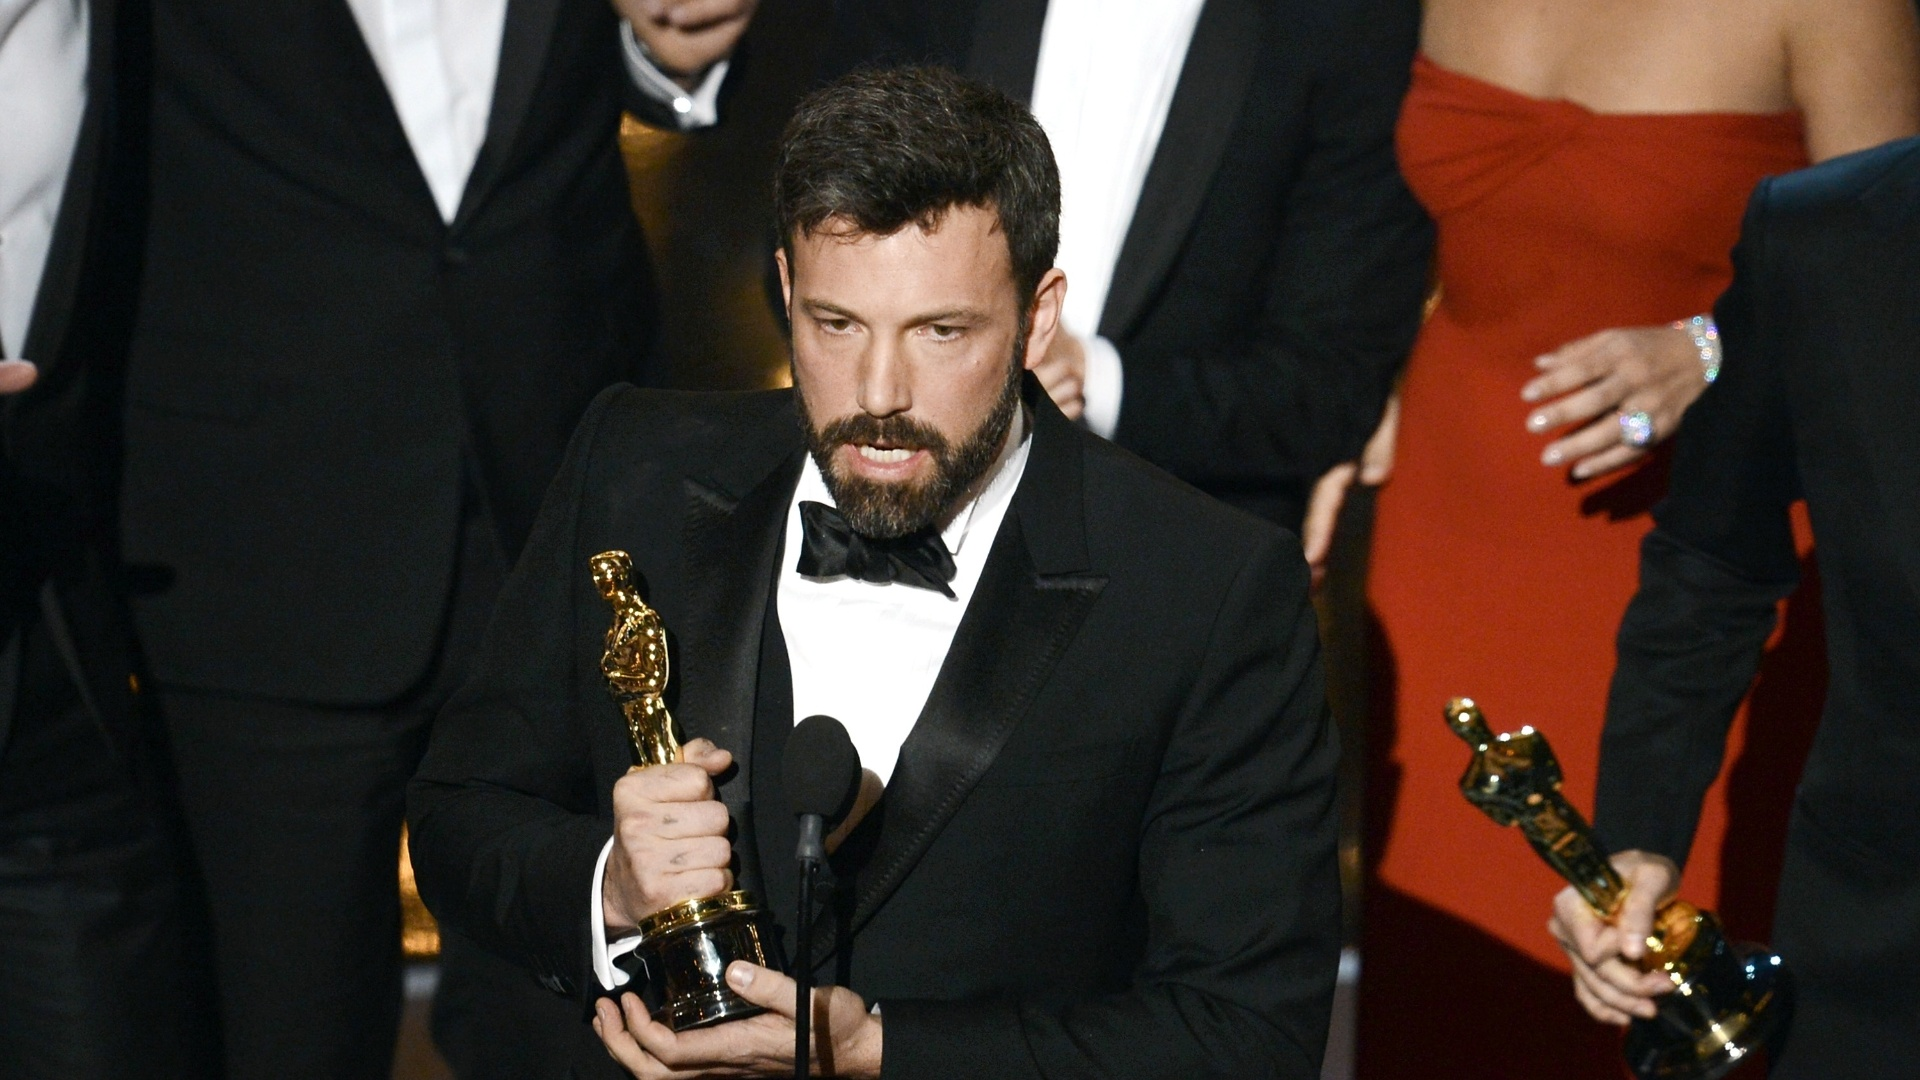 24.fev.2013 - Ben Affleck agradece a escolha de seu filme